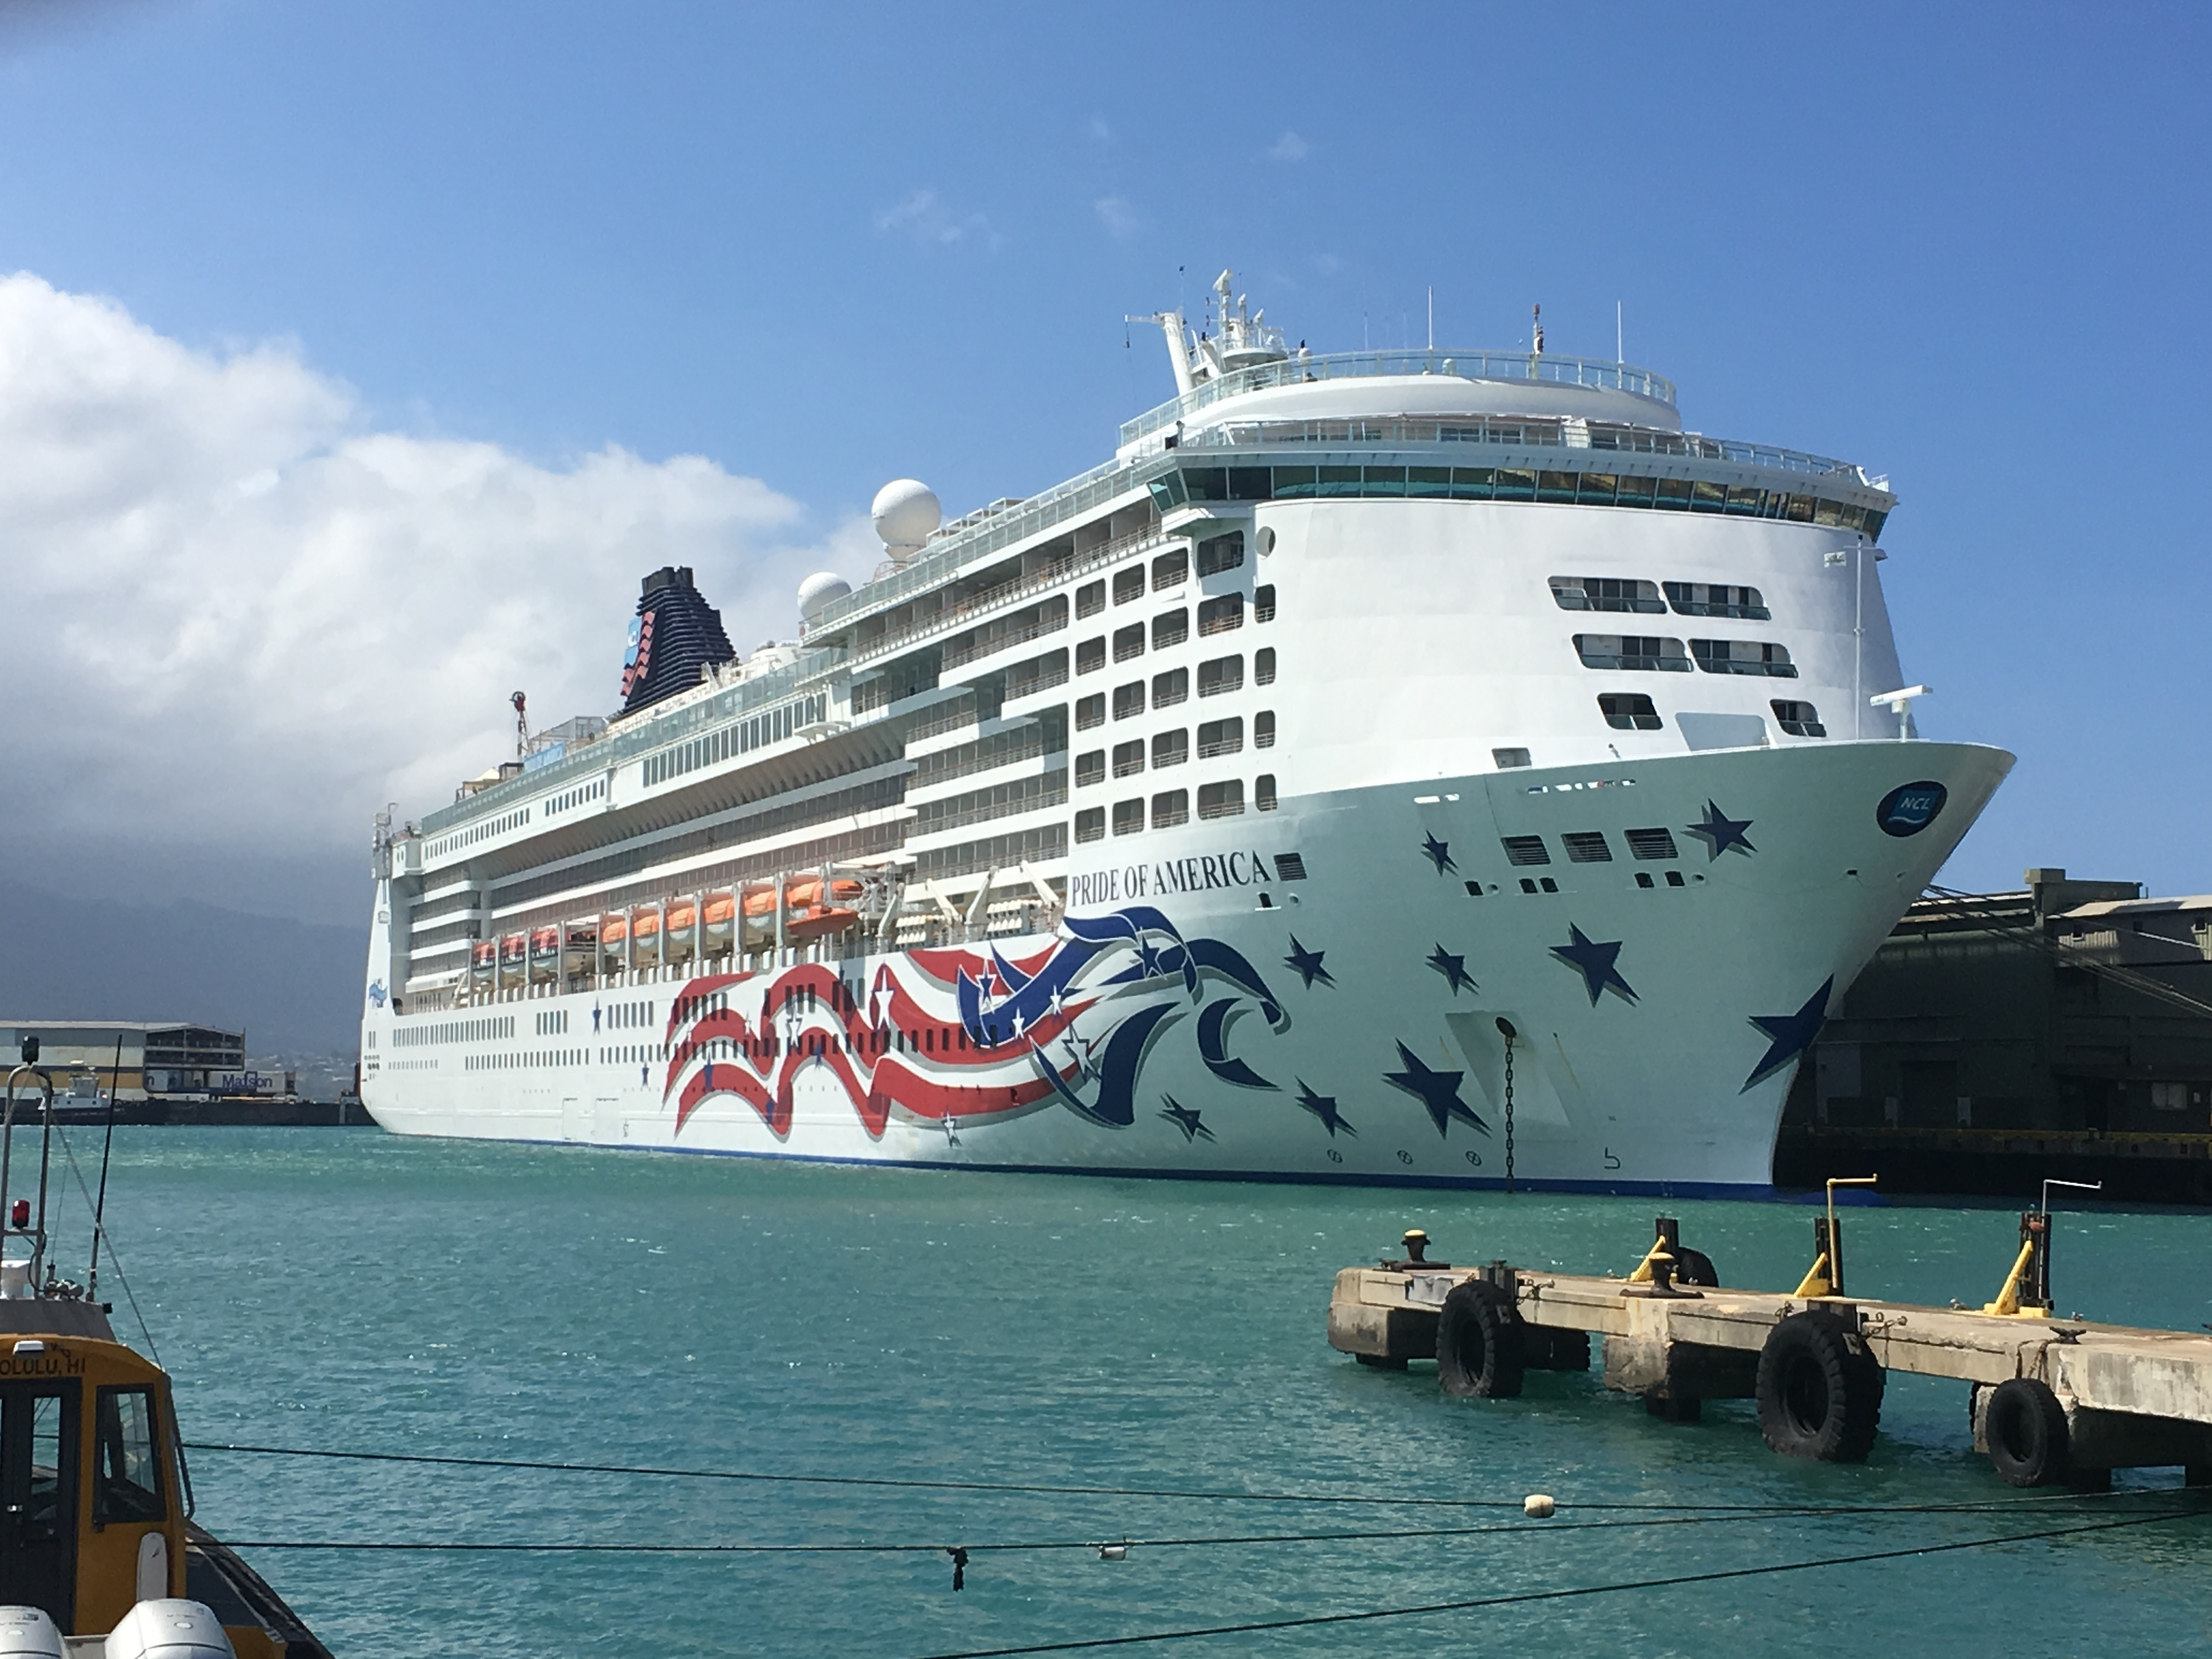 hawaii on the pride of america pride of america cruise. Black Bedroom Furniture Sets. Home Design Ideas